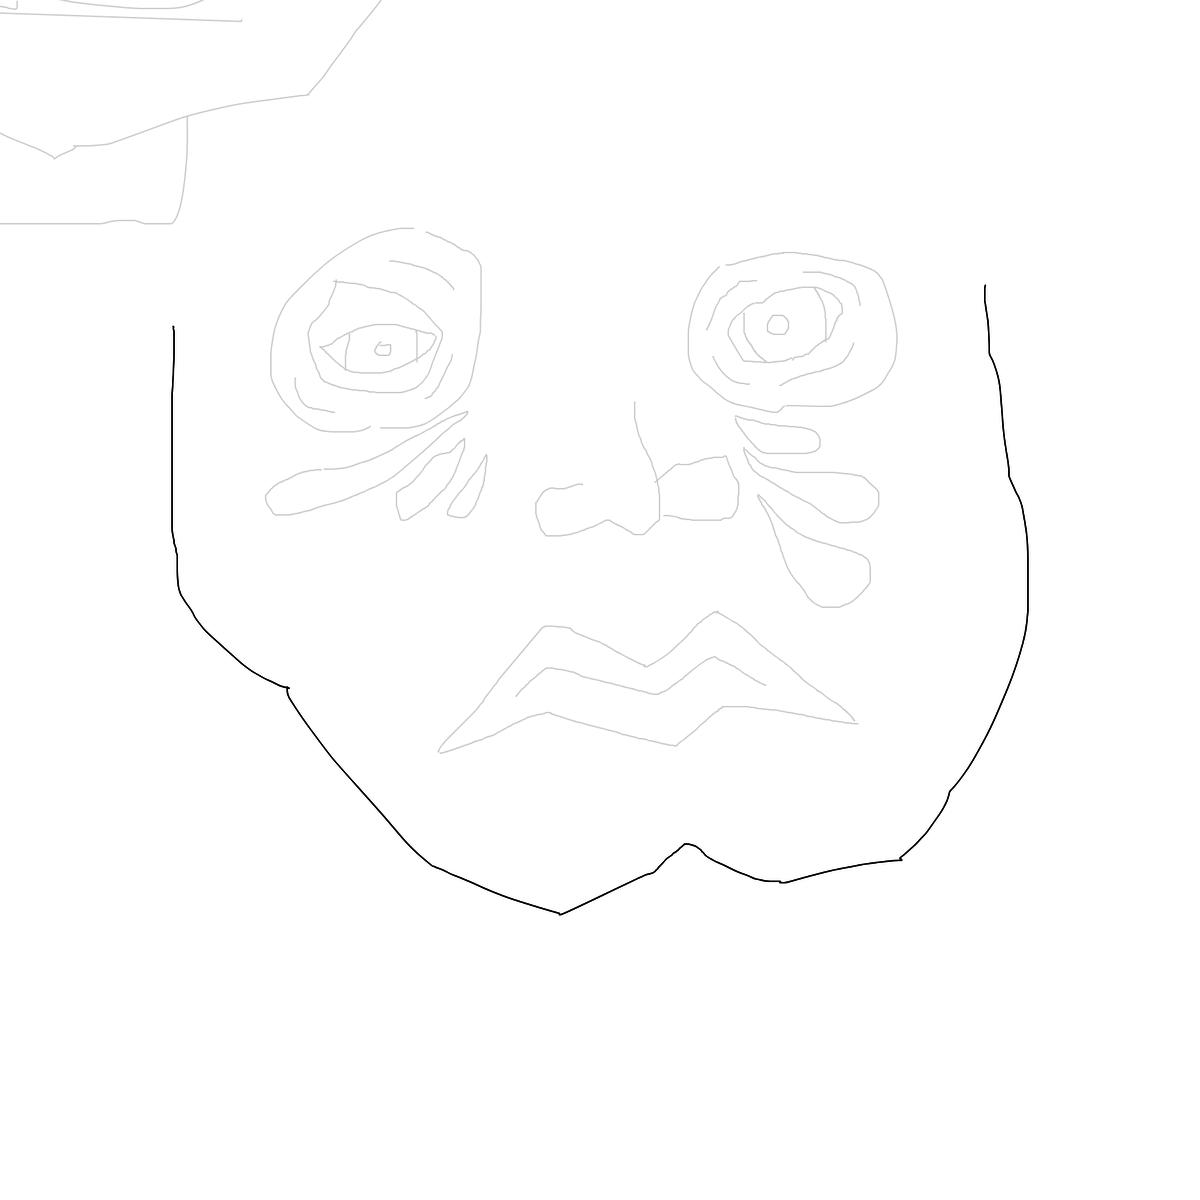 BAAAM drawing#24176 lat:46.5207824707031250lng: 6.6338996887207030